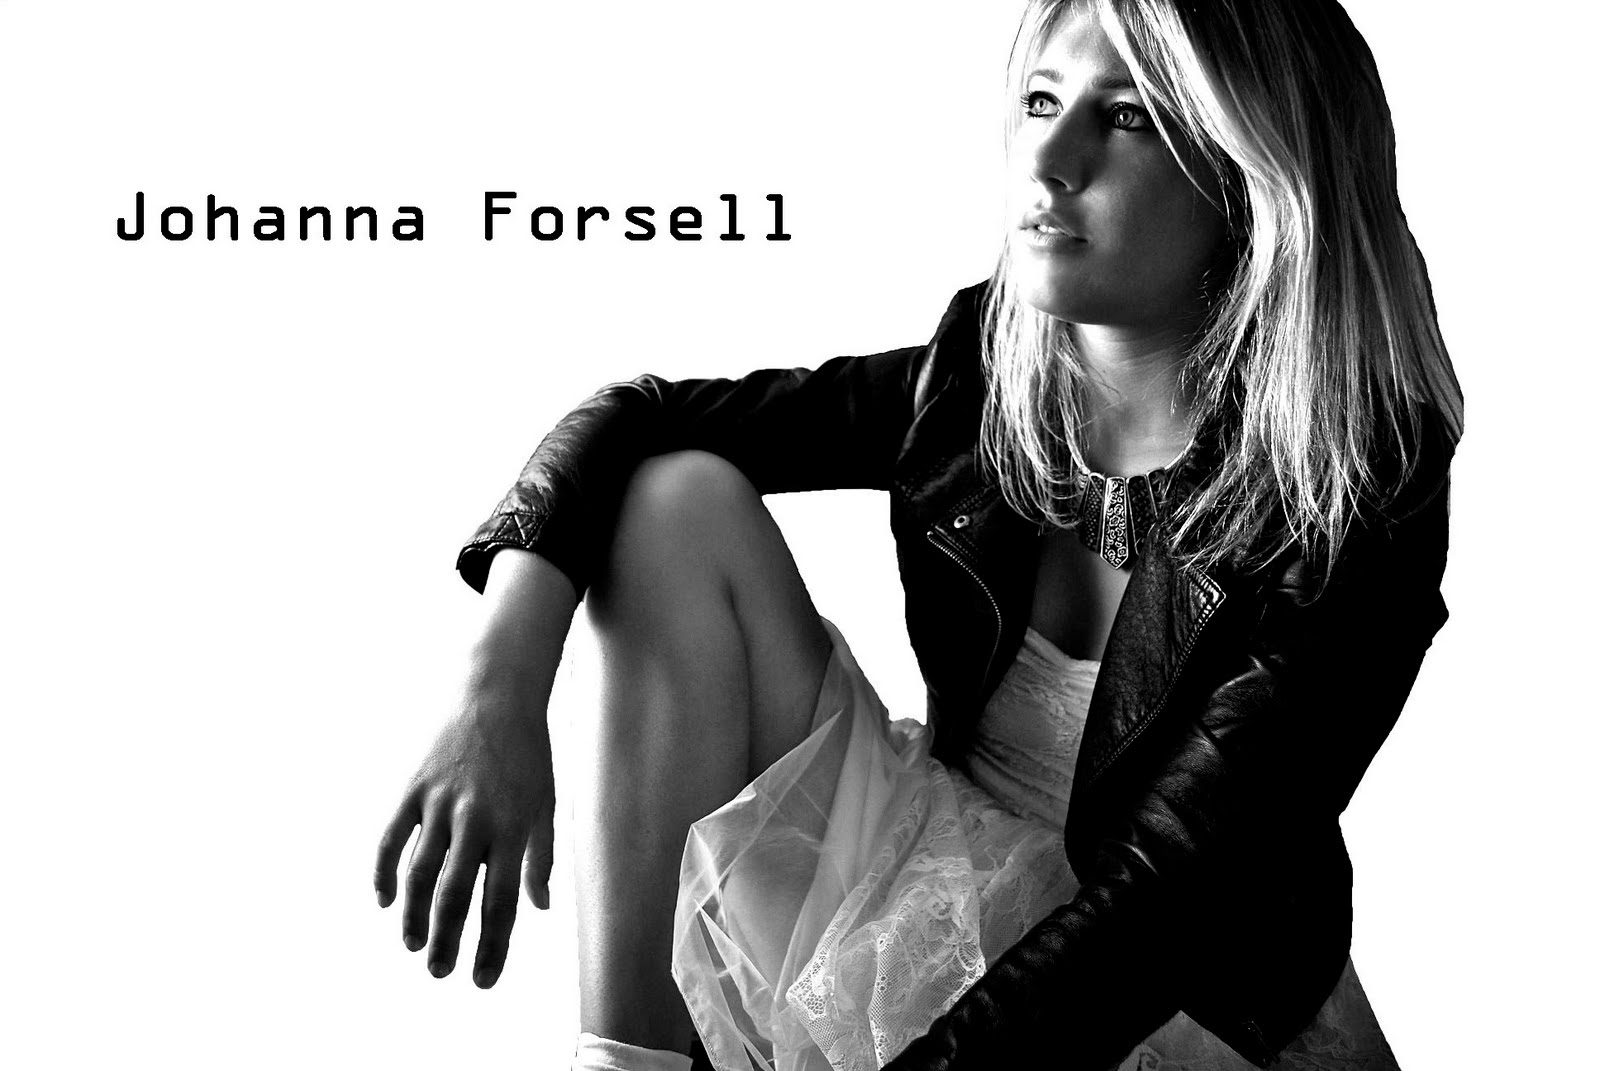 Johanna Forsell